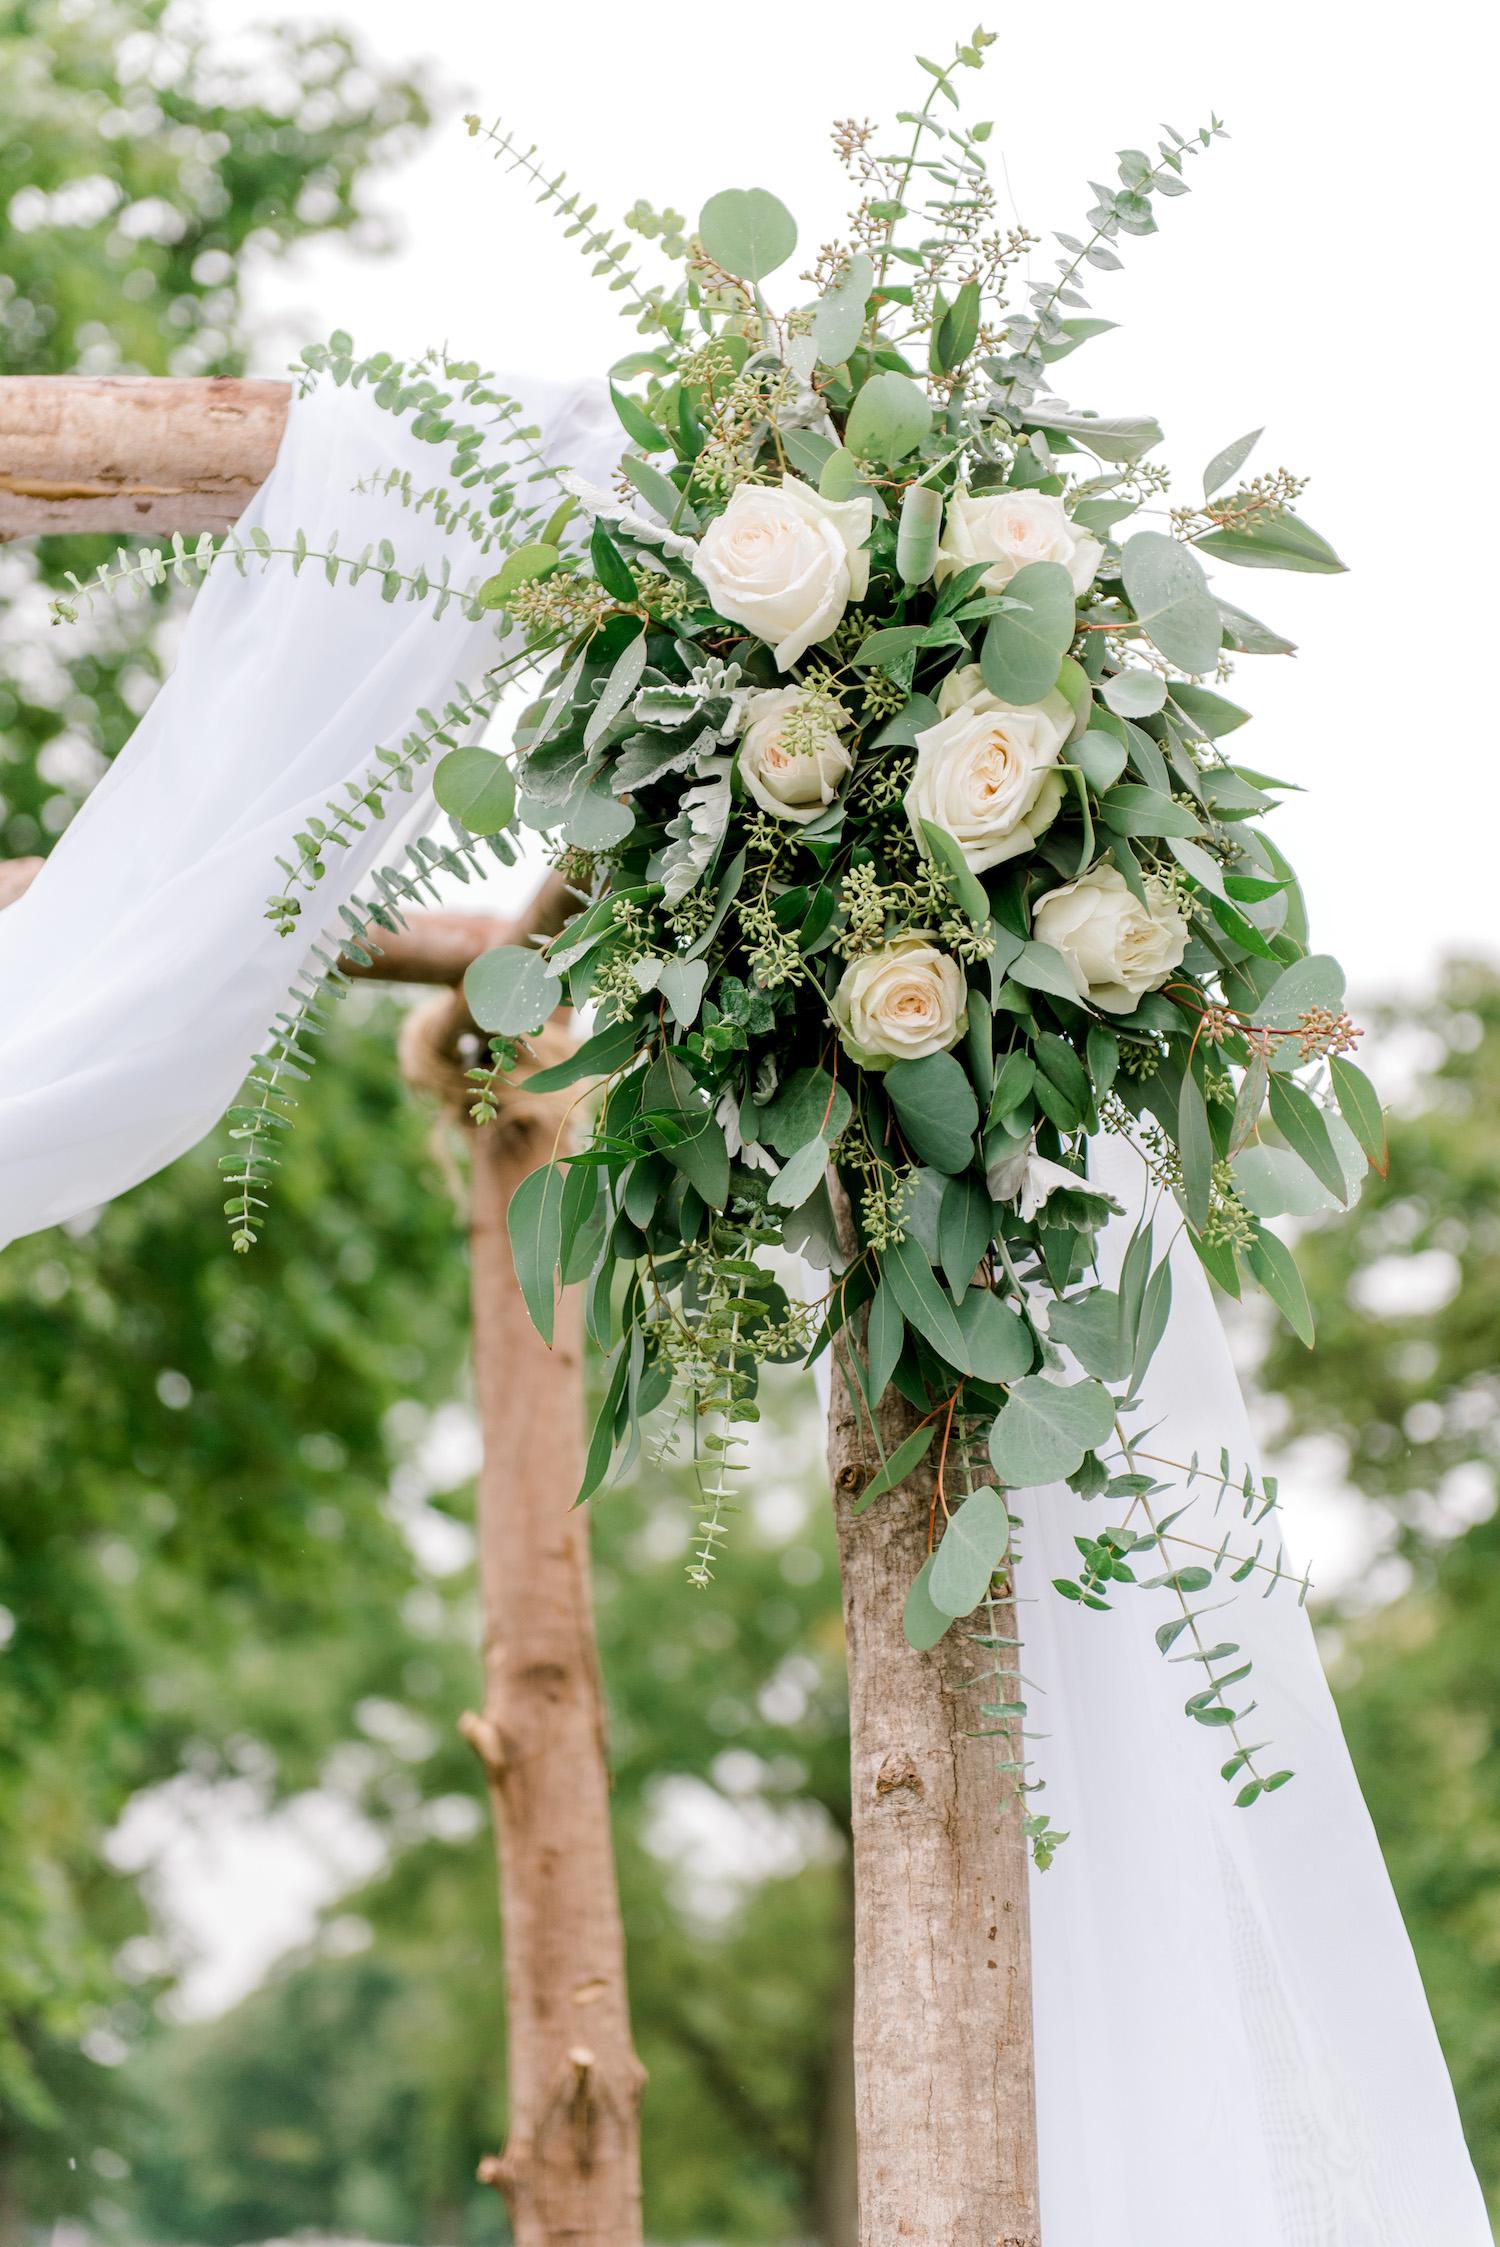 Floral arrangement on Wallinwood Springs Golf Course wedding arch